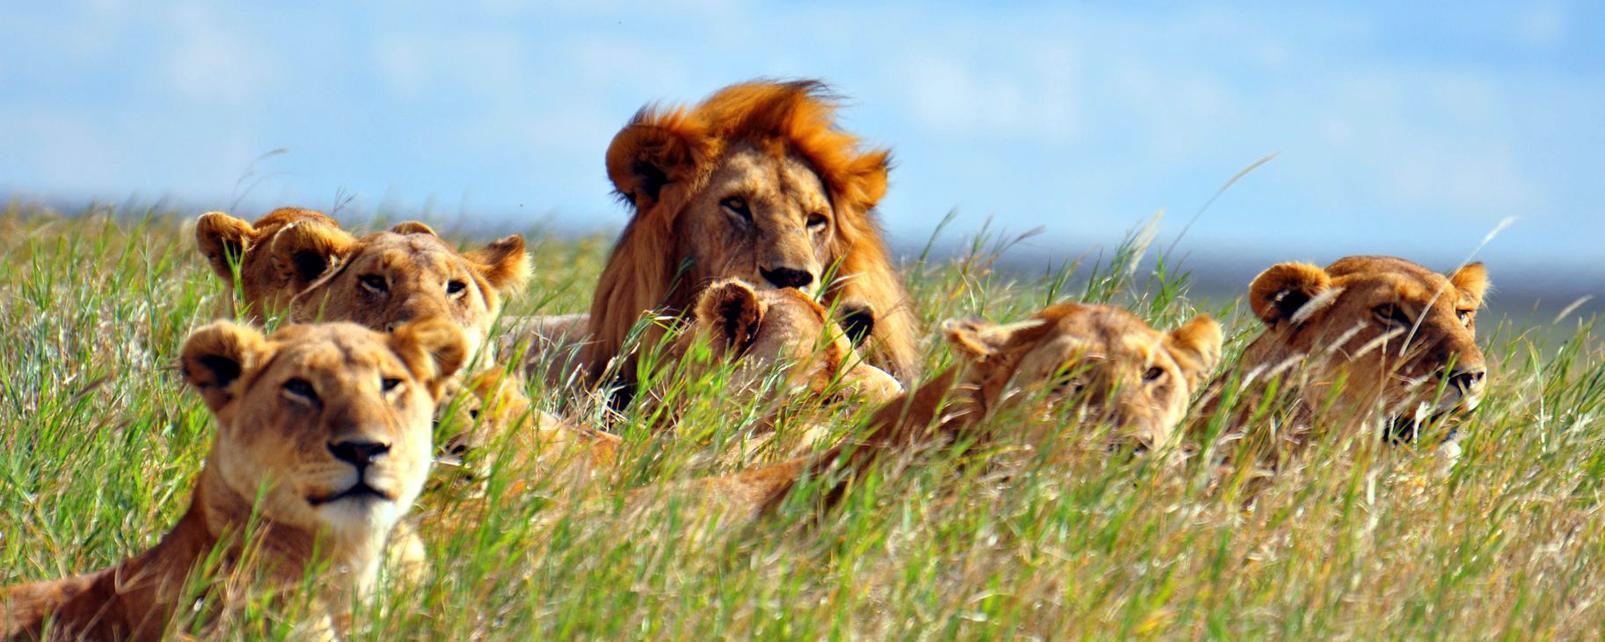 Afrique; Tanzanie; Serengeti National Park;